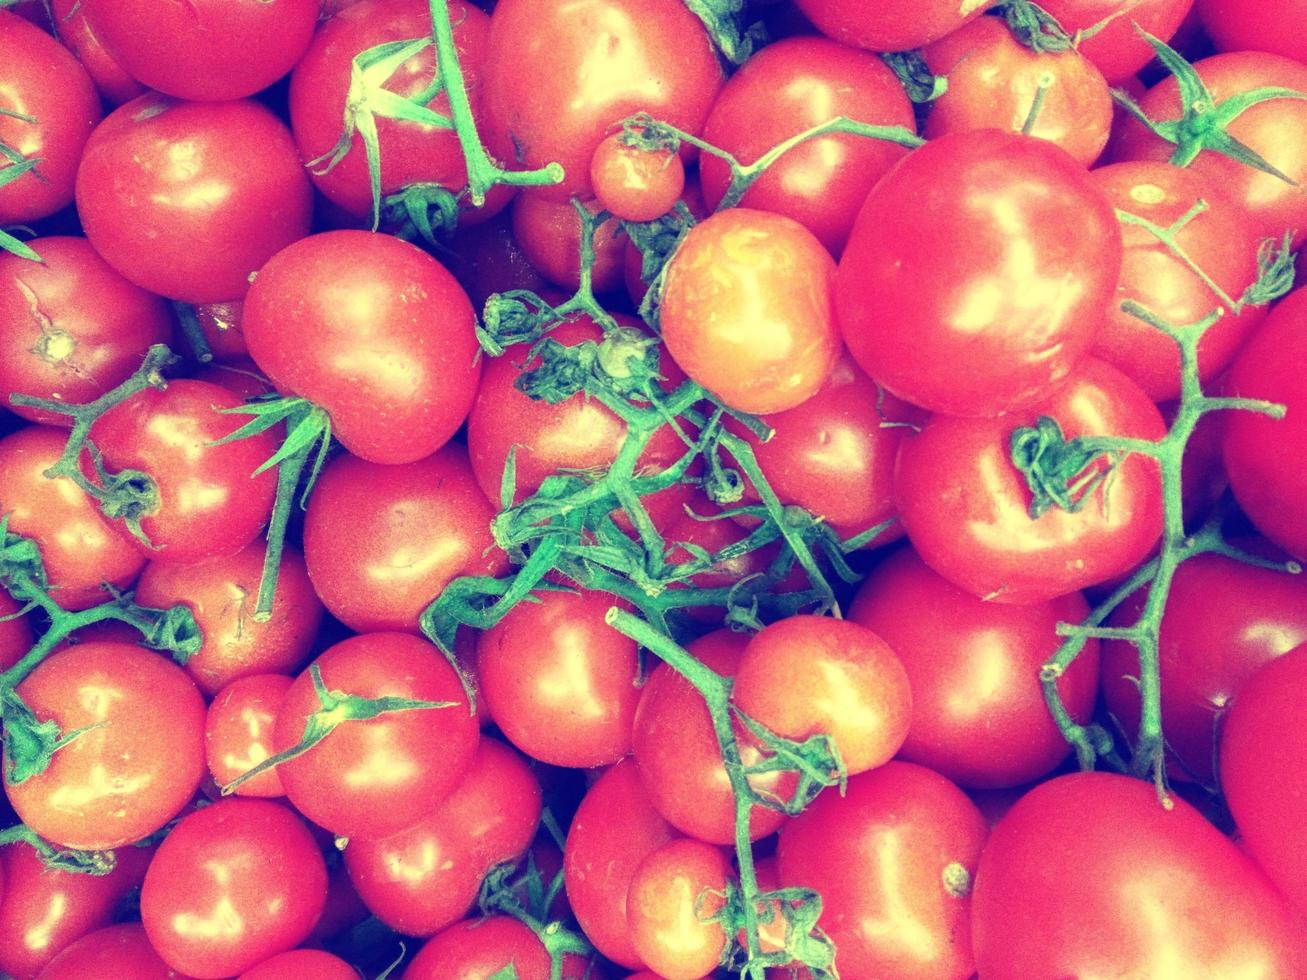 pomodoro all'aperto in giardino foto